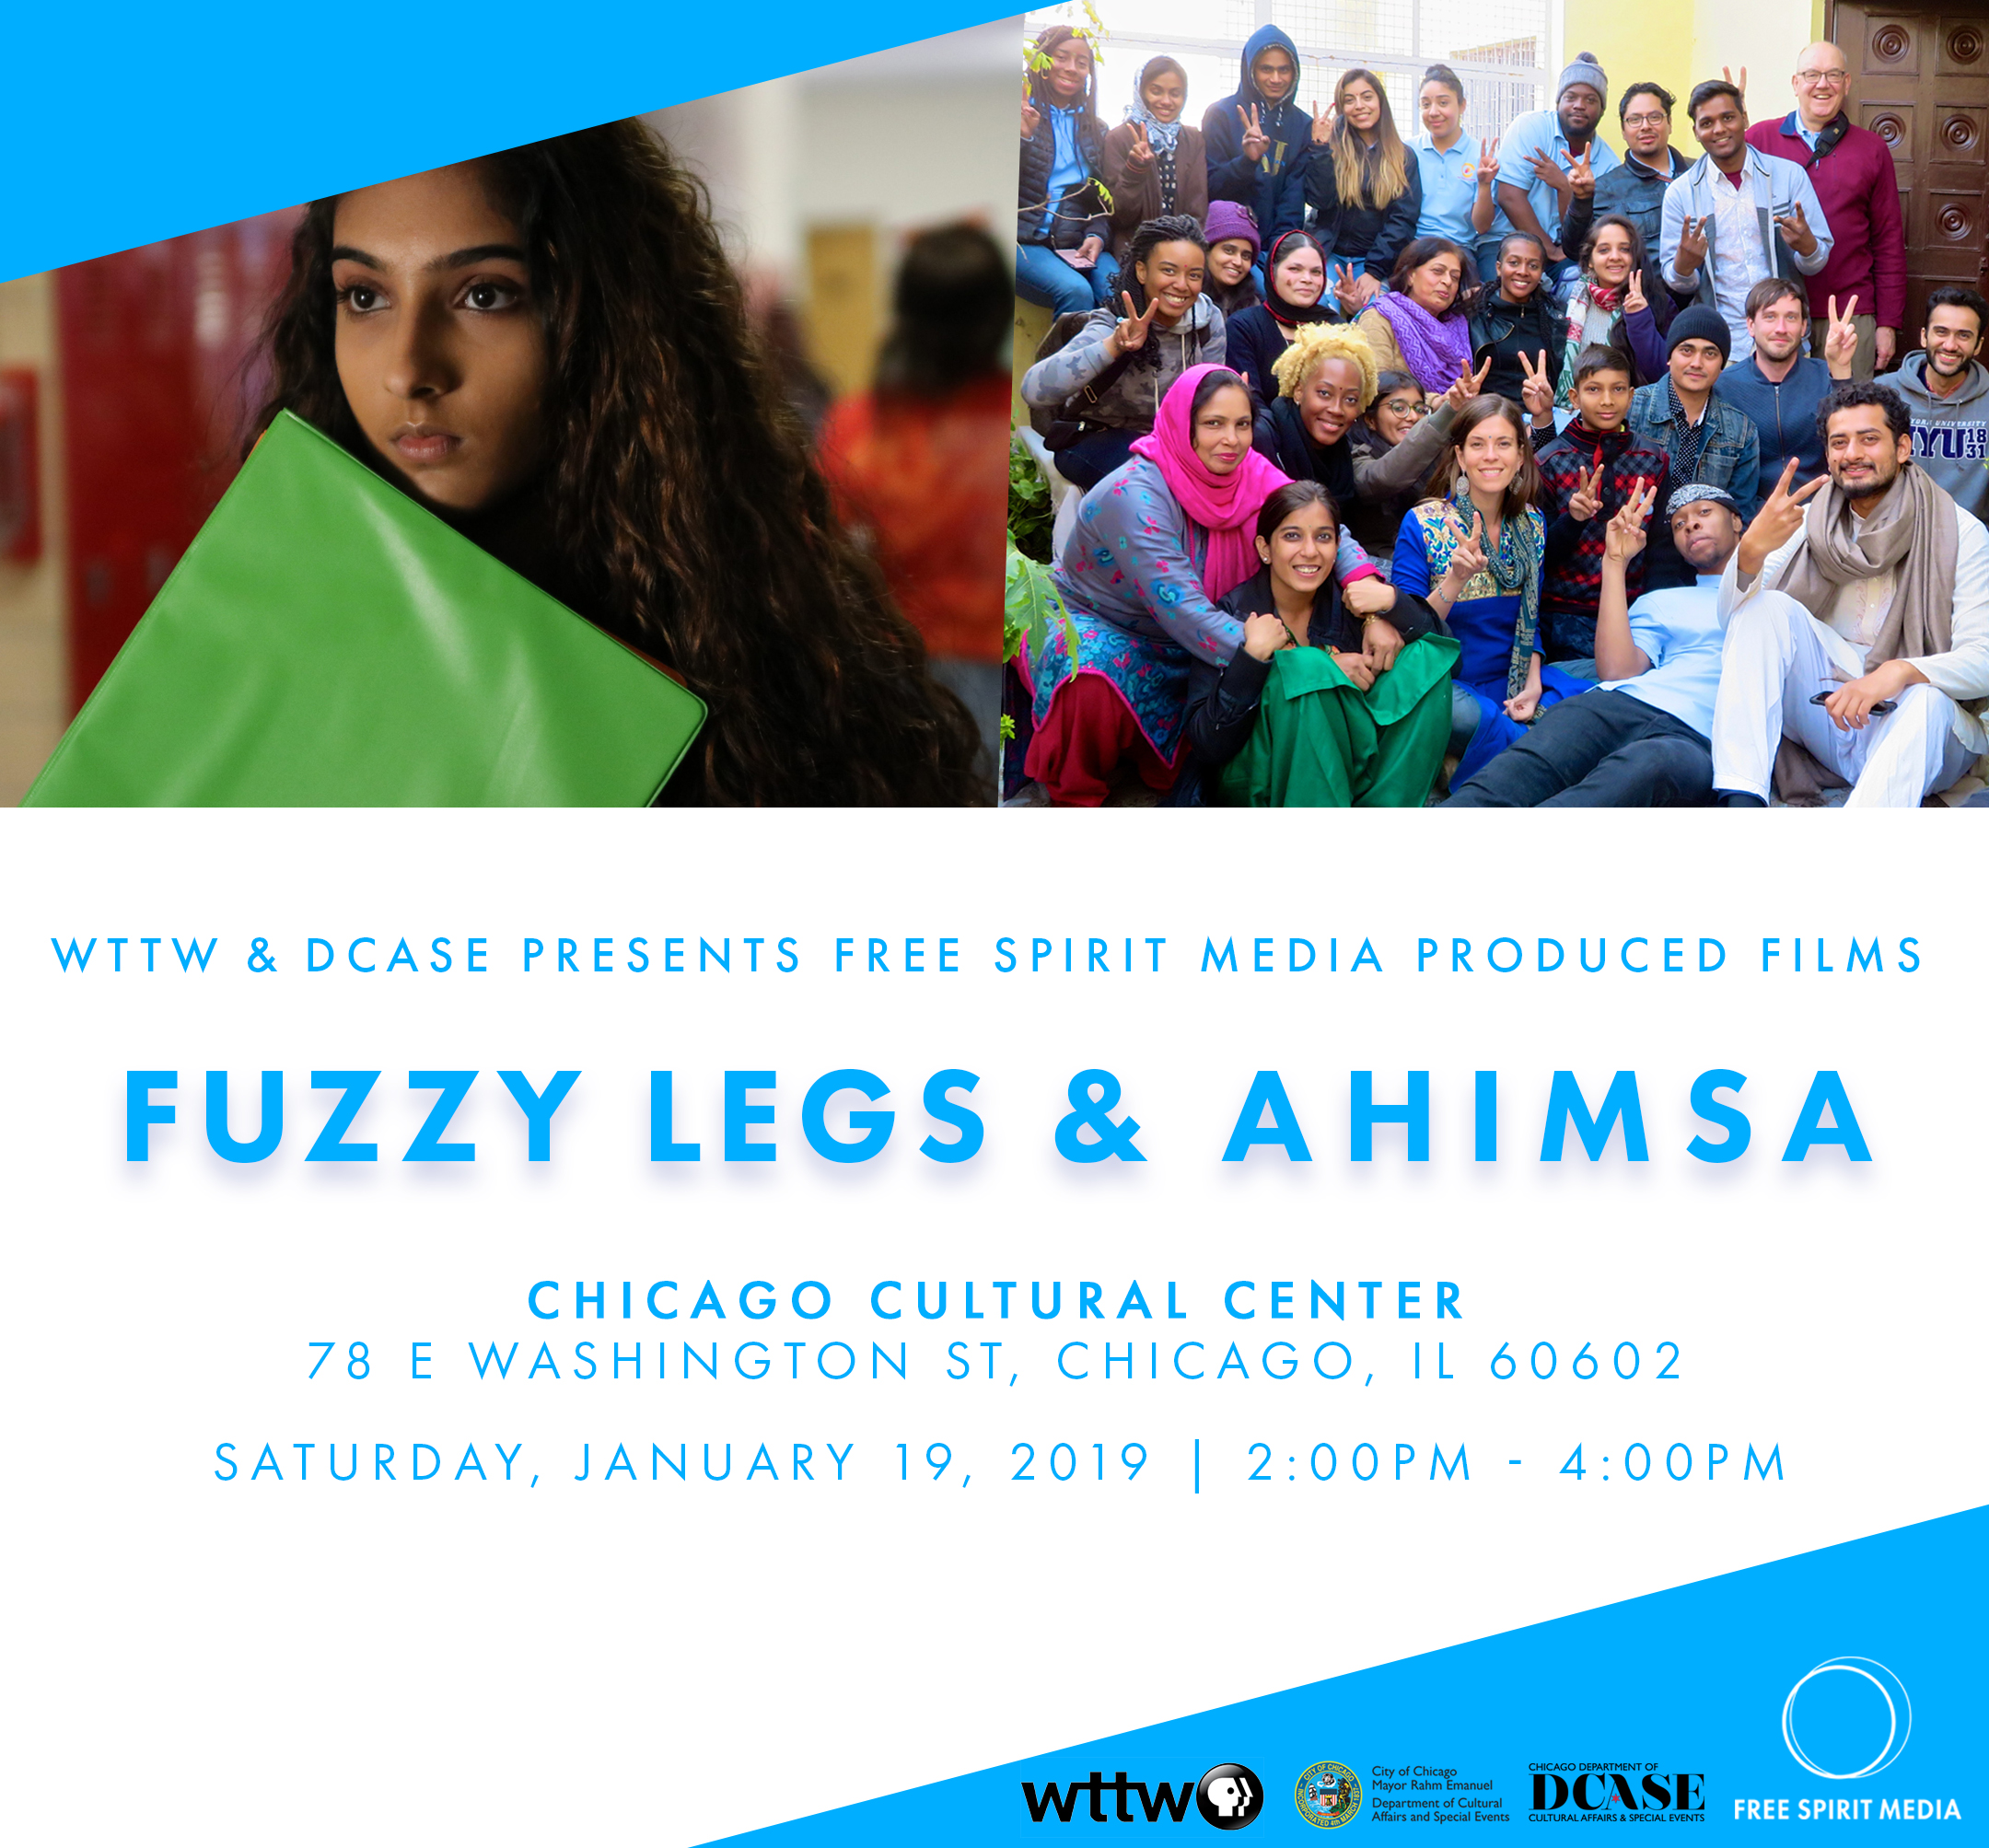 Fuzzy Legs-Ahimsa Screening flyer-for website-2.jpg